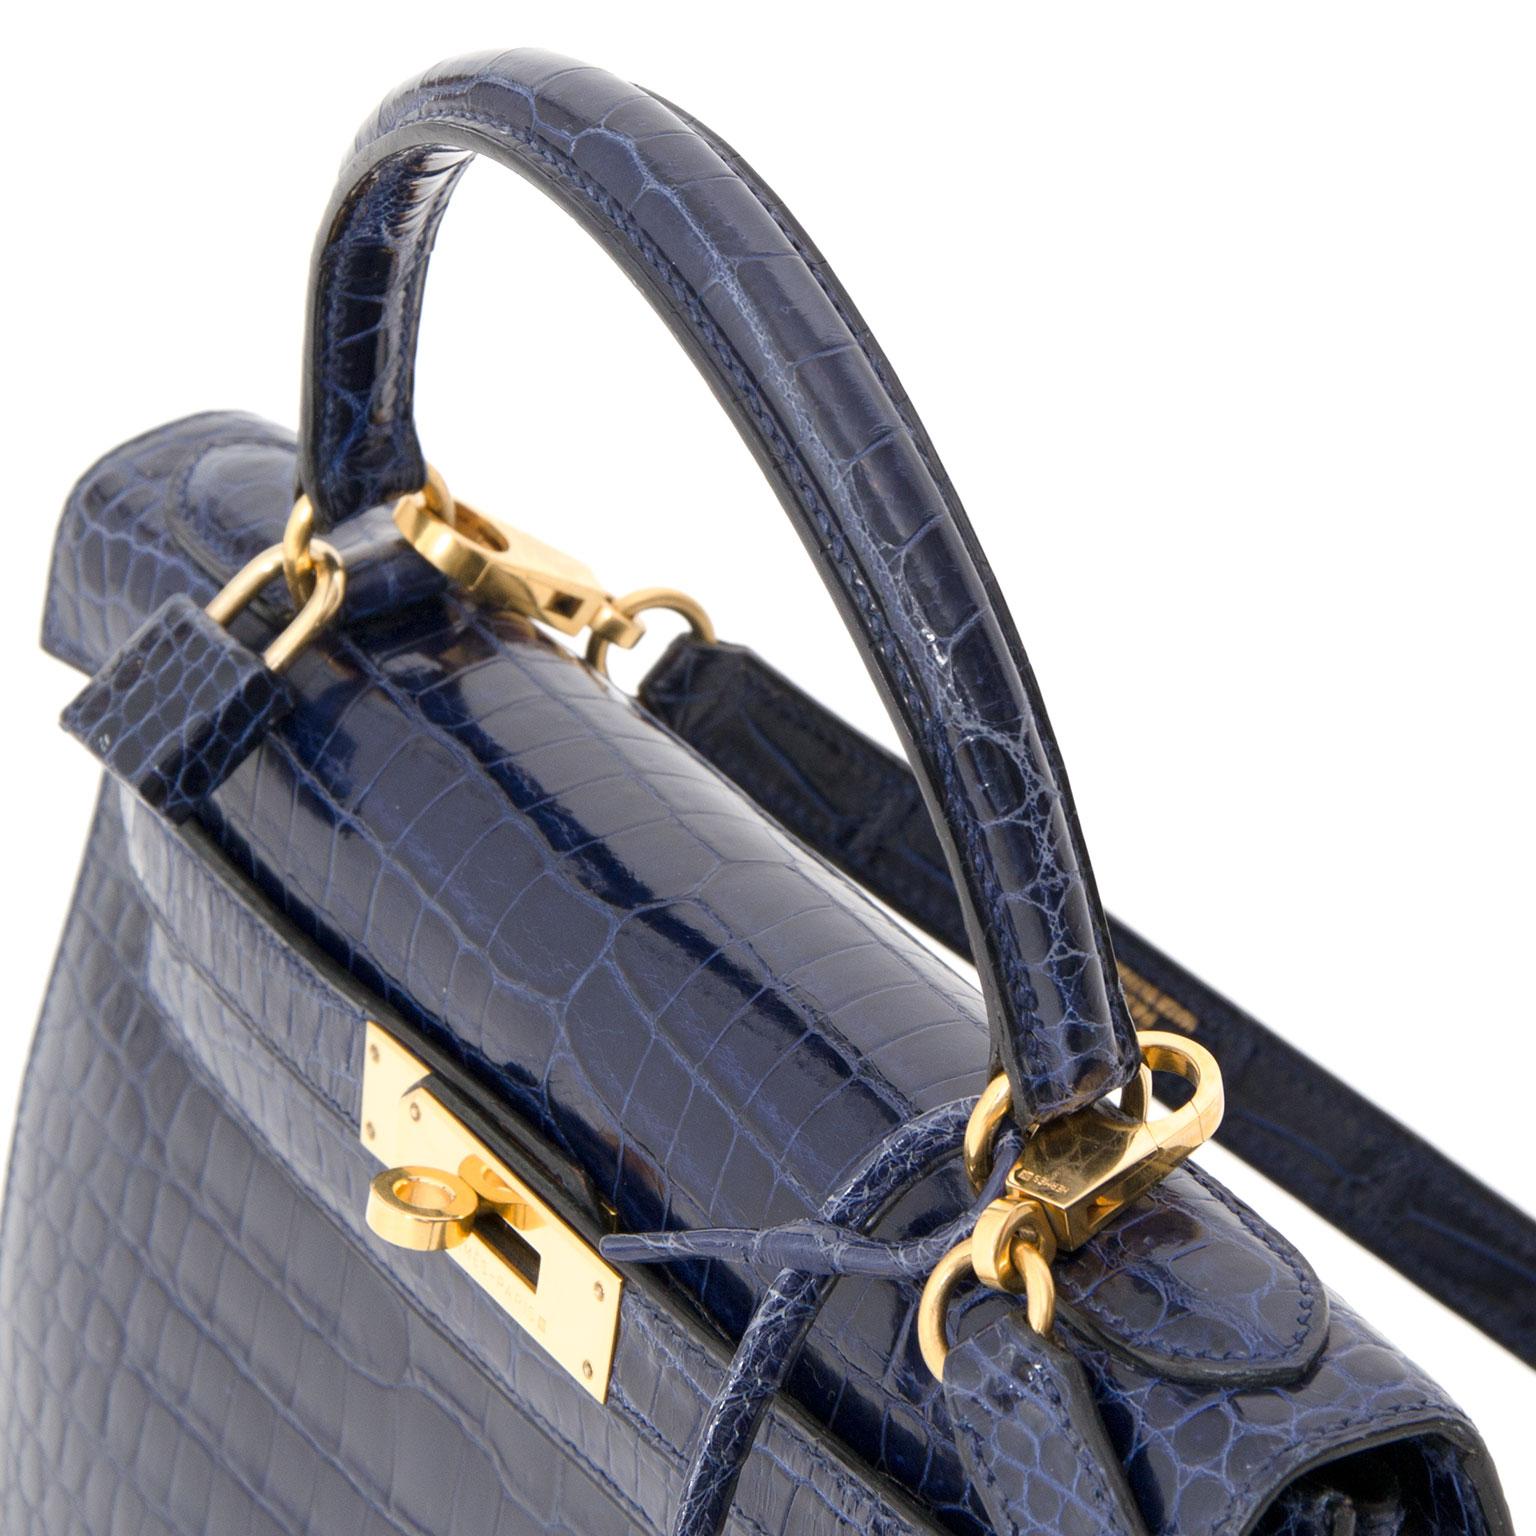 Skip The Waitinglist 100% Authentic Hermes Kelly 28 Porosus Blue